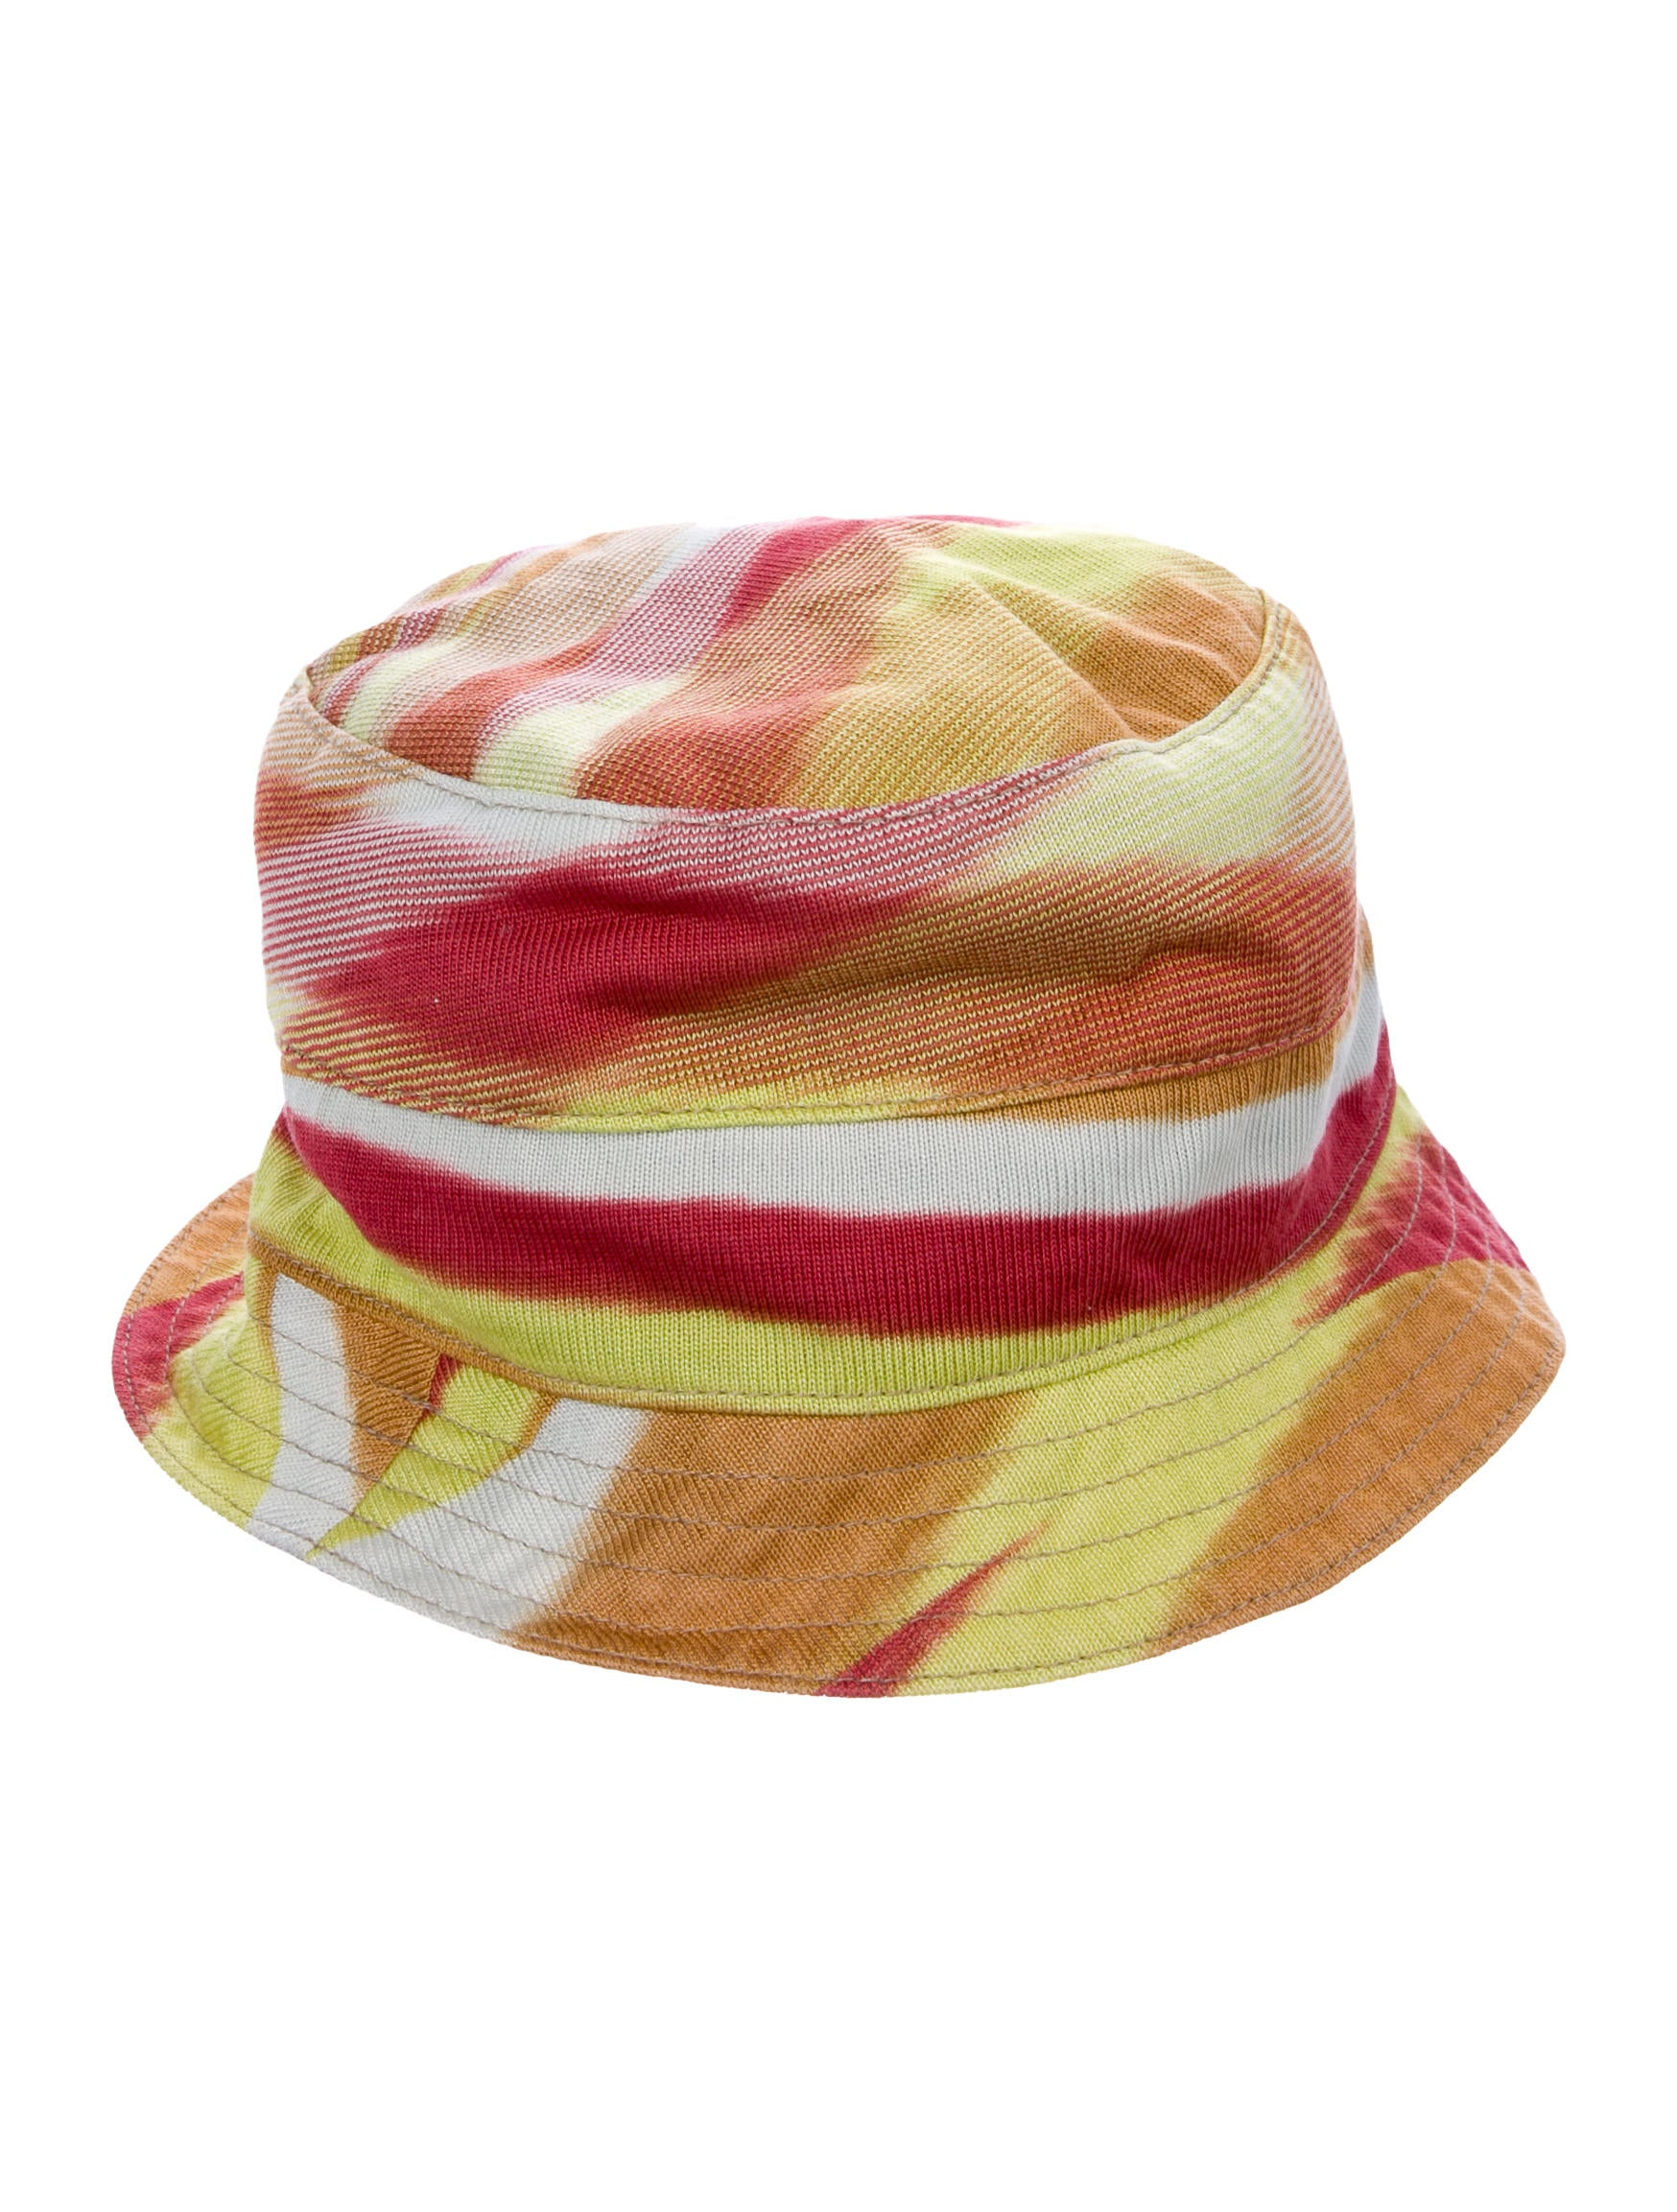 Missoni Printed Bucket Hat - Accessories - MIS50427  d45b1cae1d6